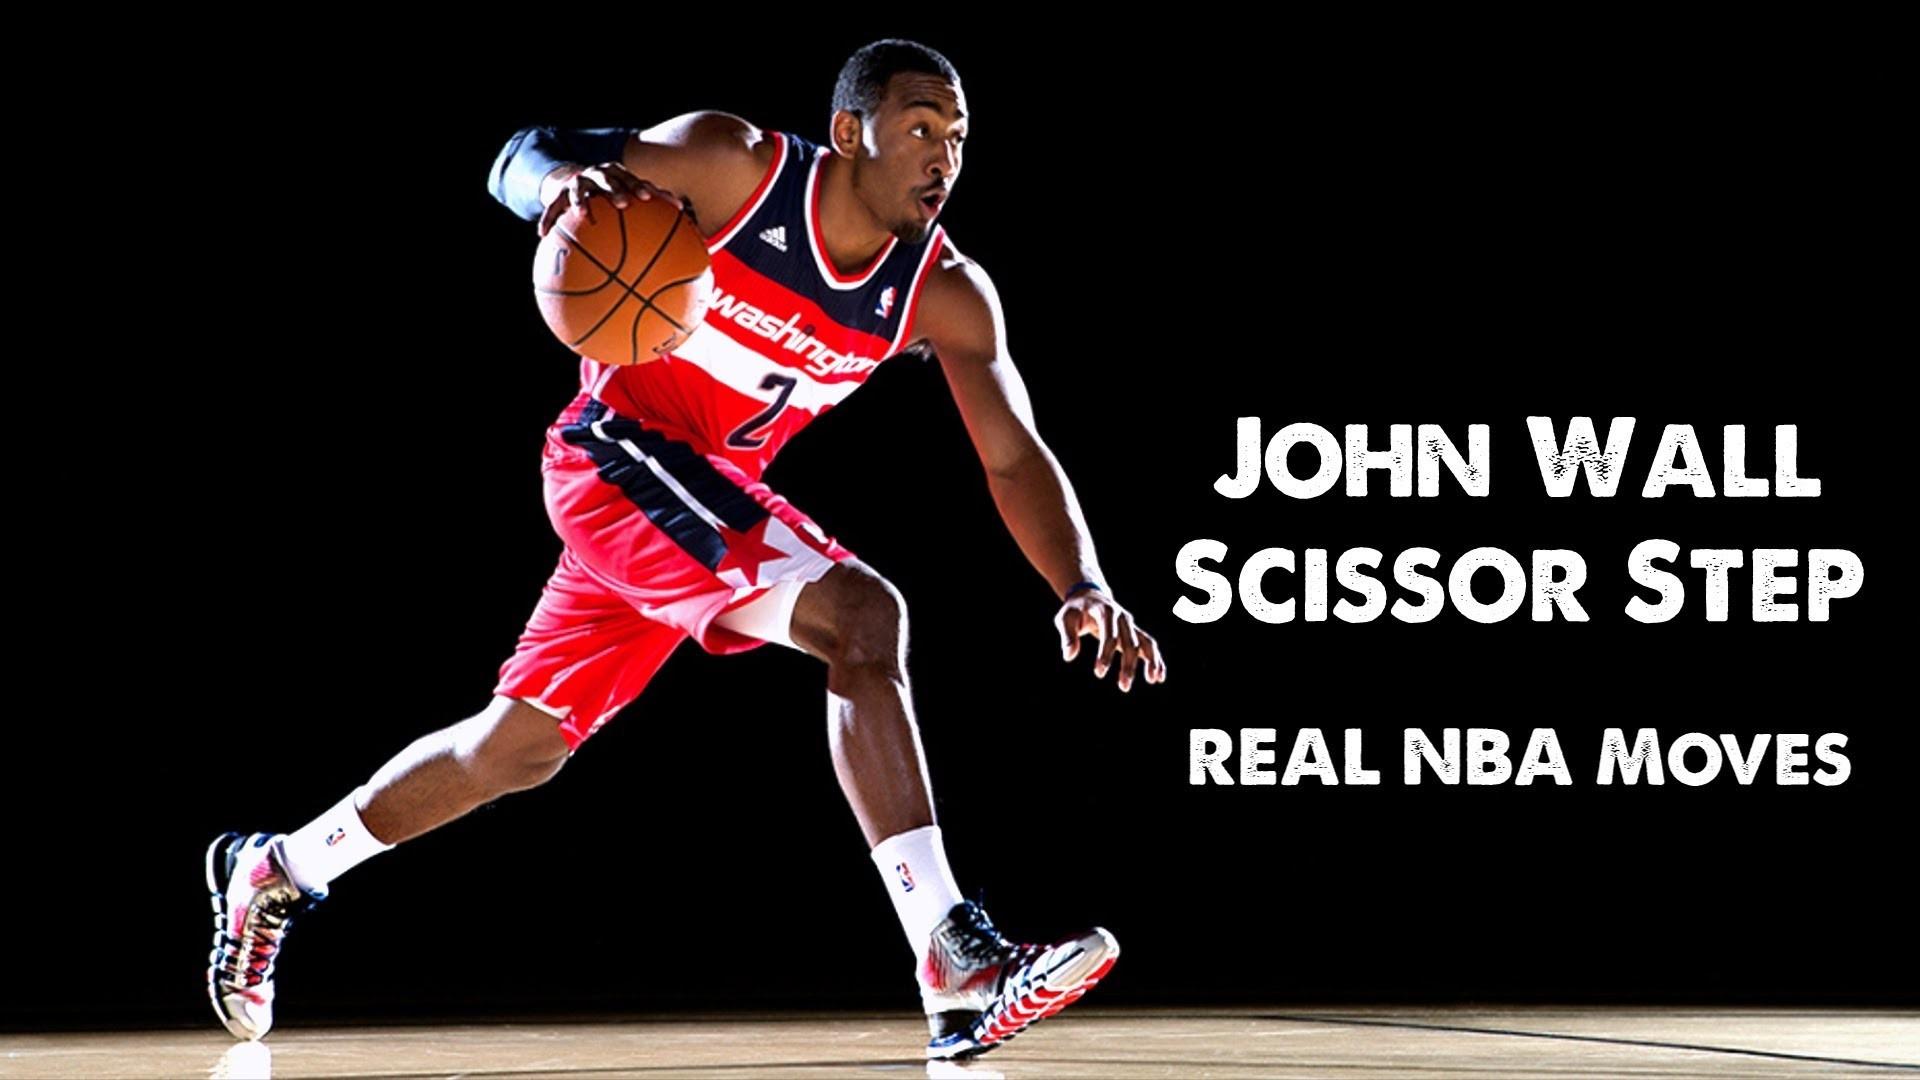 Real NBA Moves: John Wall Scissor Step (featuring Zach LaVine)